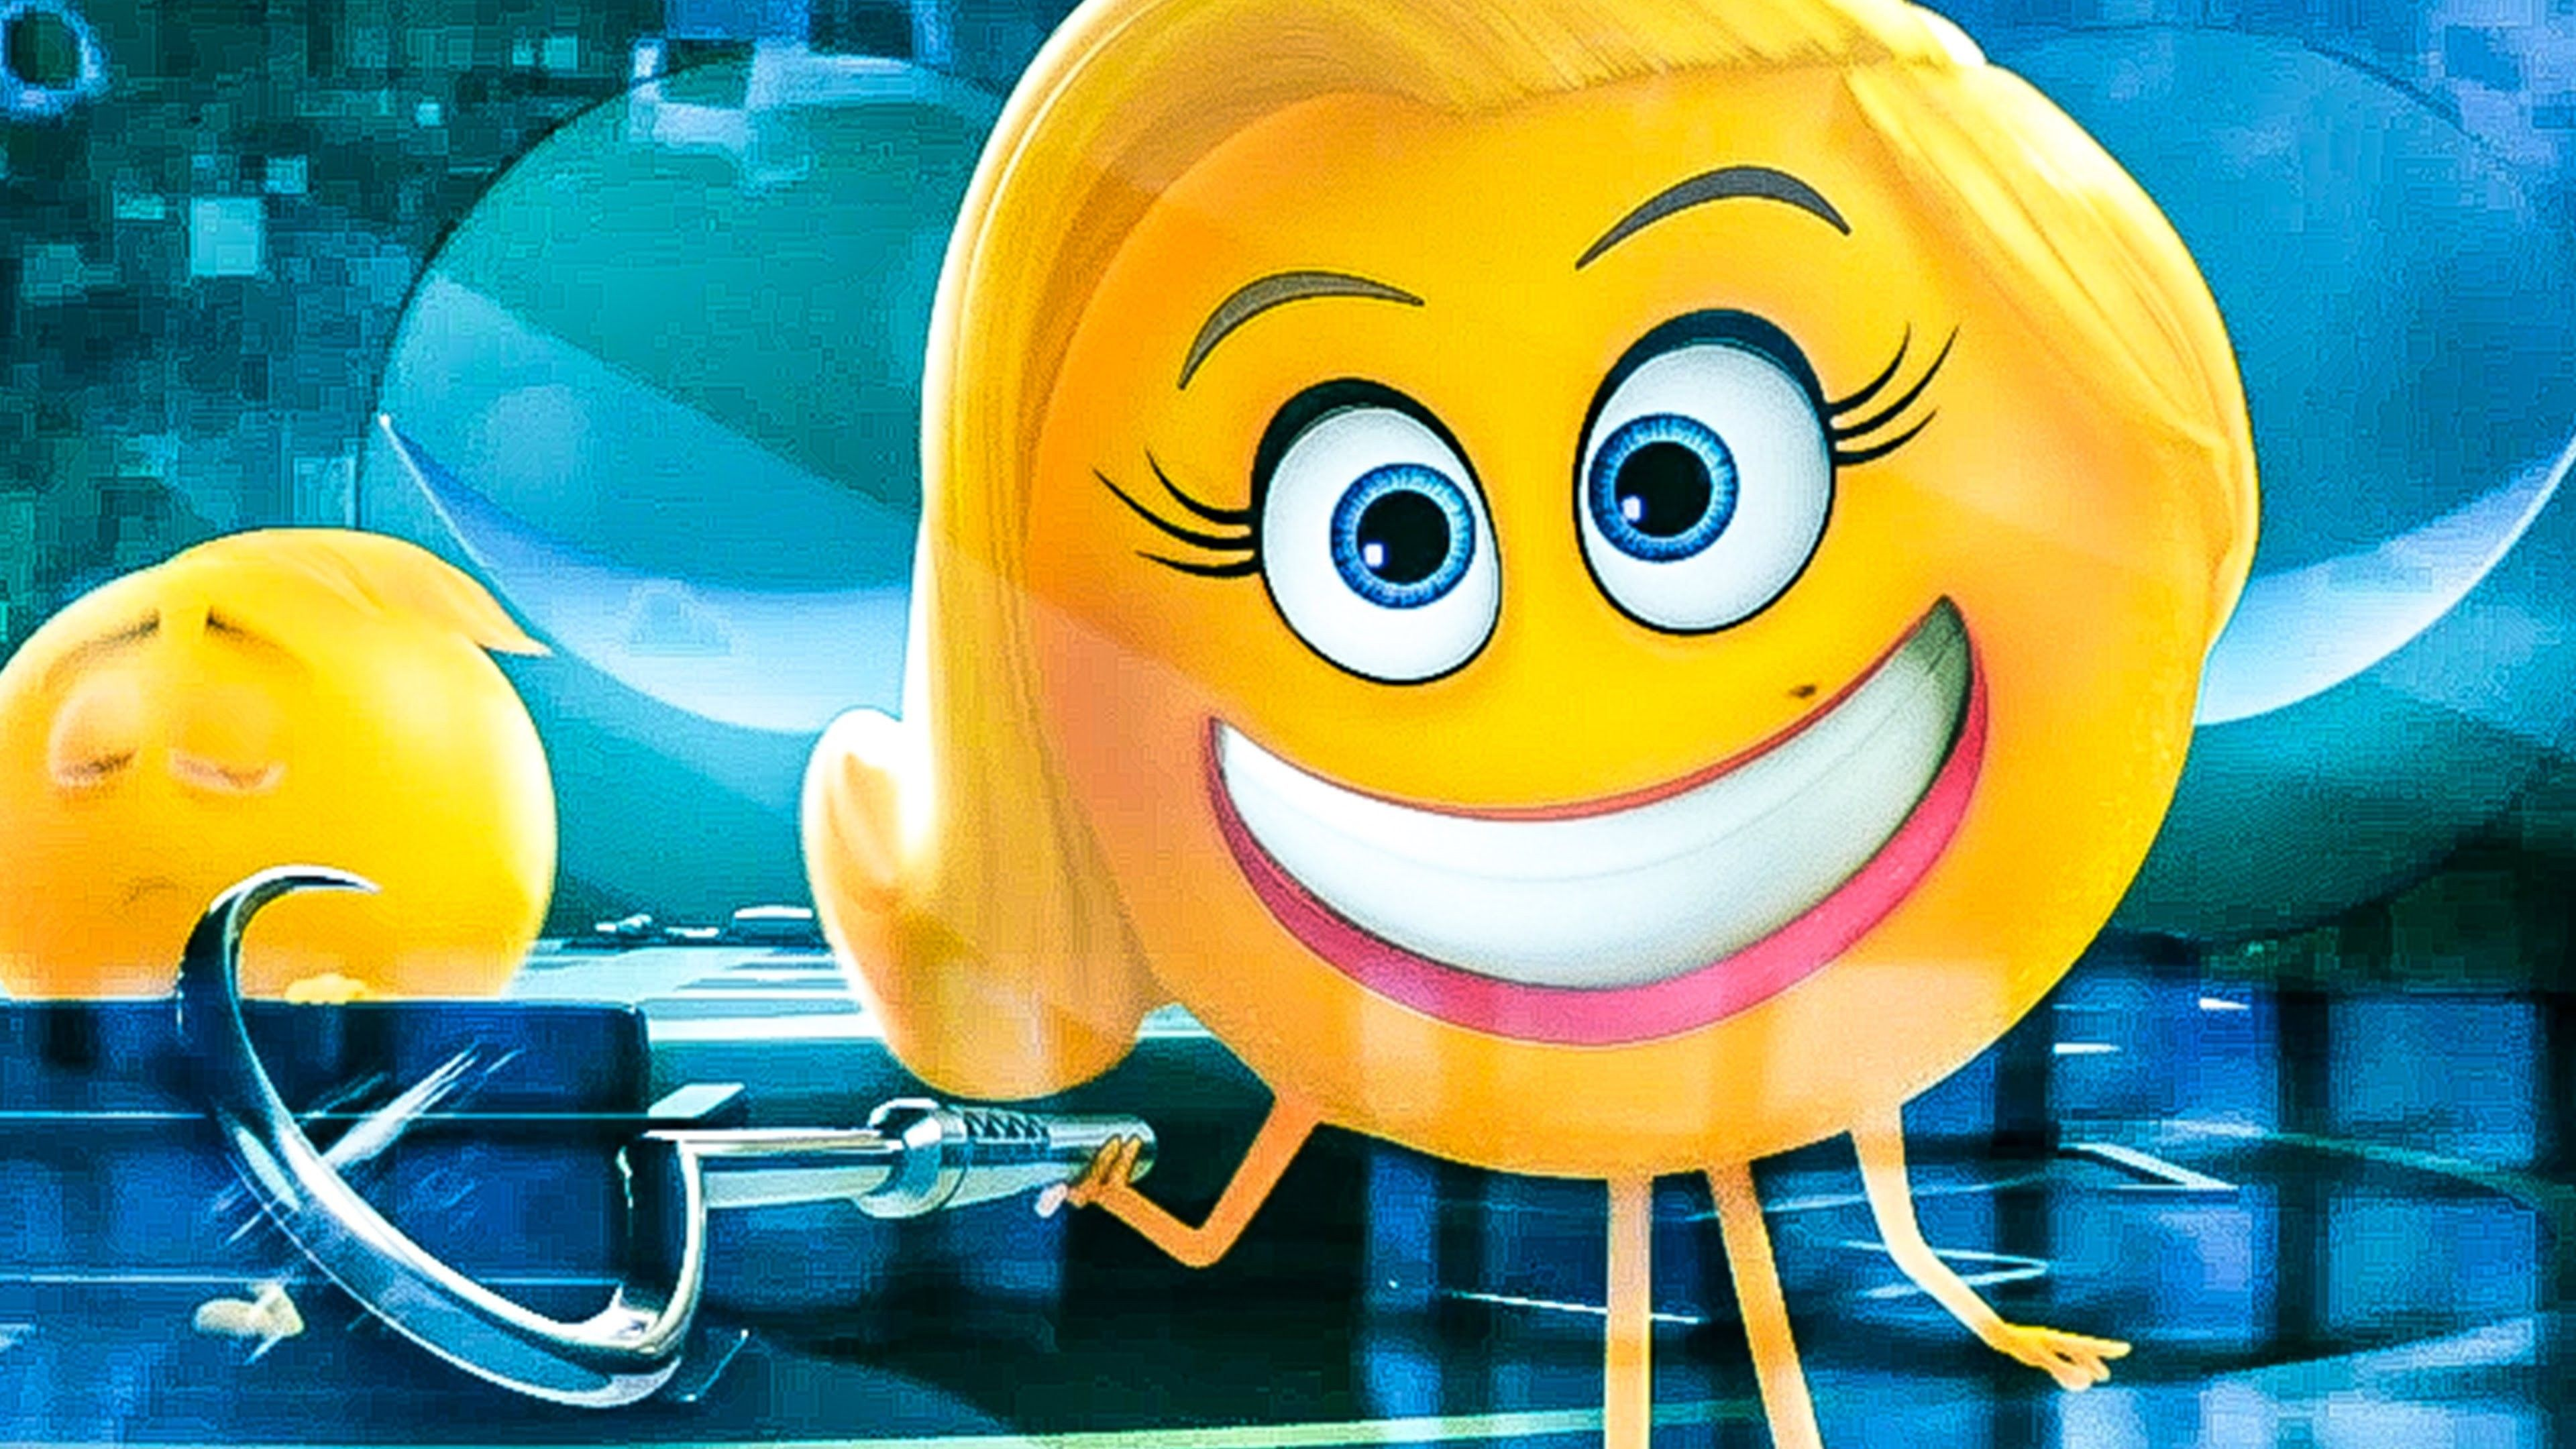 Emoji Cartoon Wallpapers - Top Free Emoji Cartoon ...